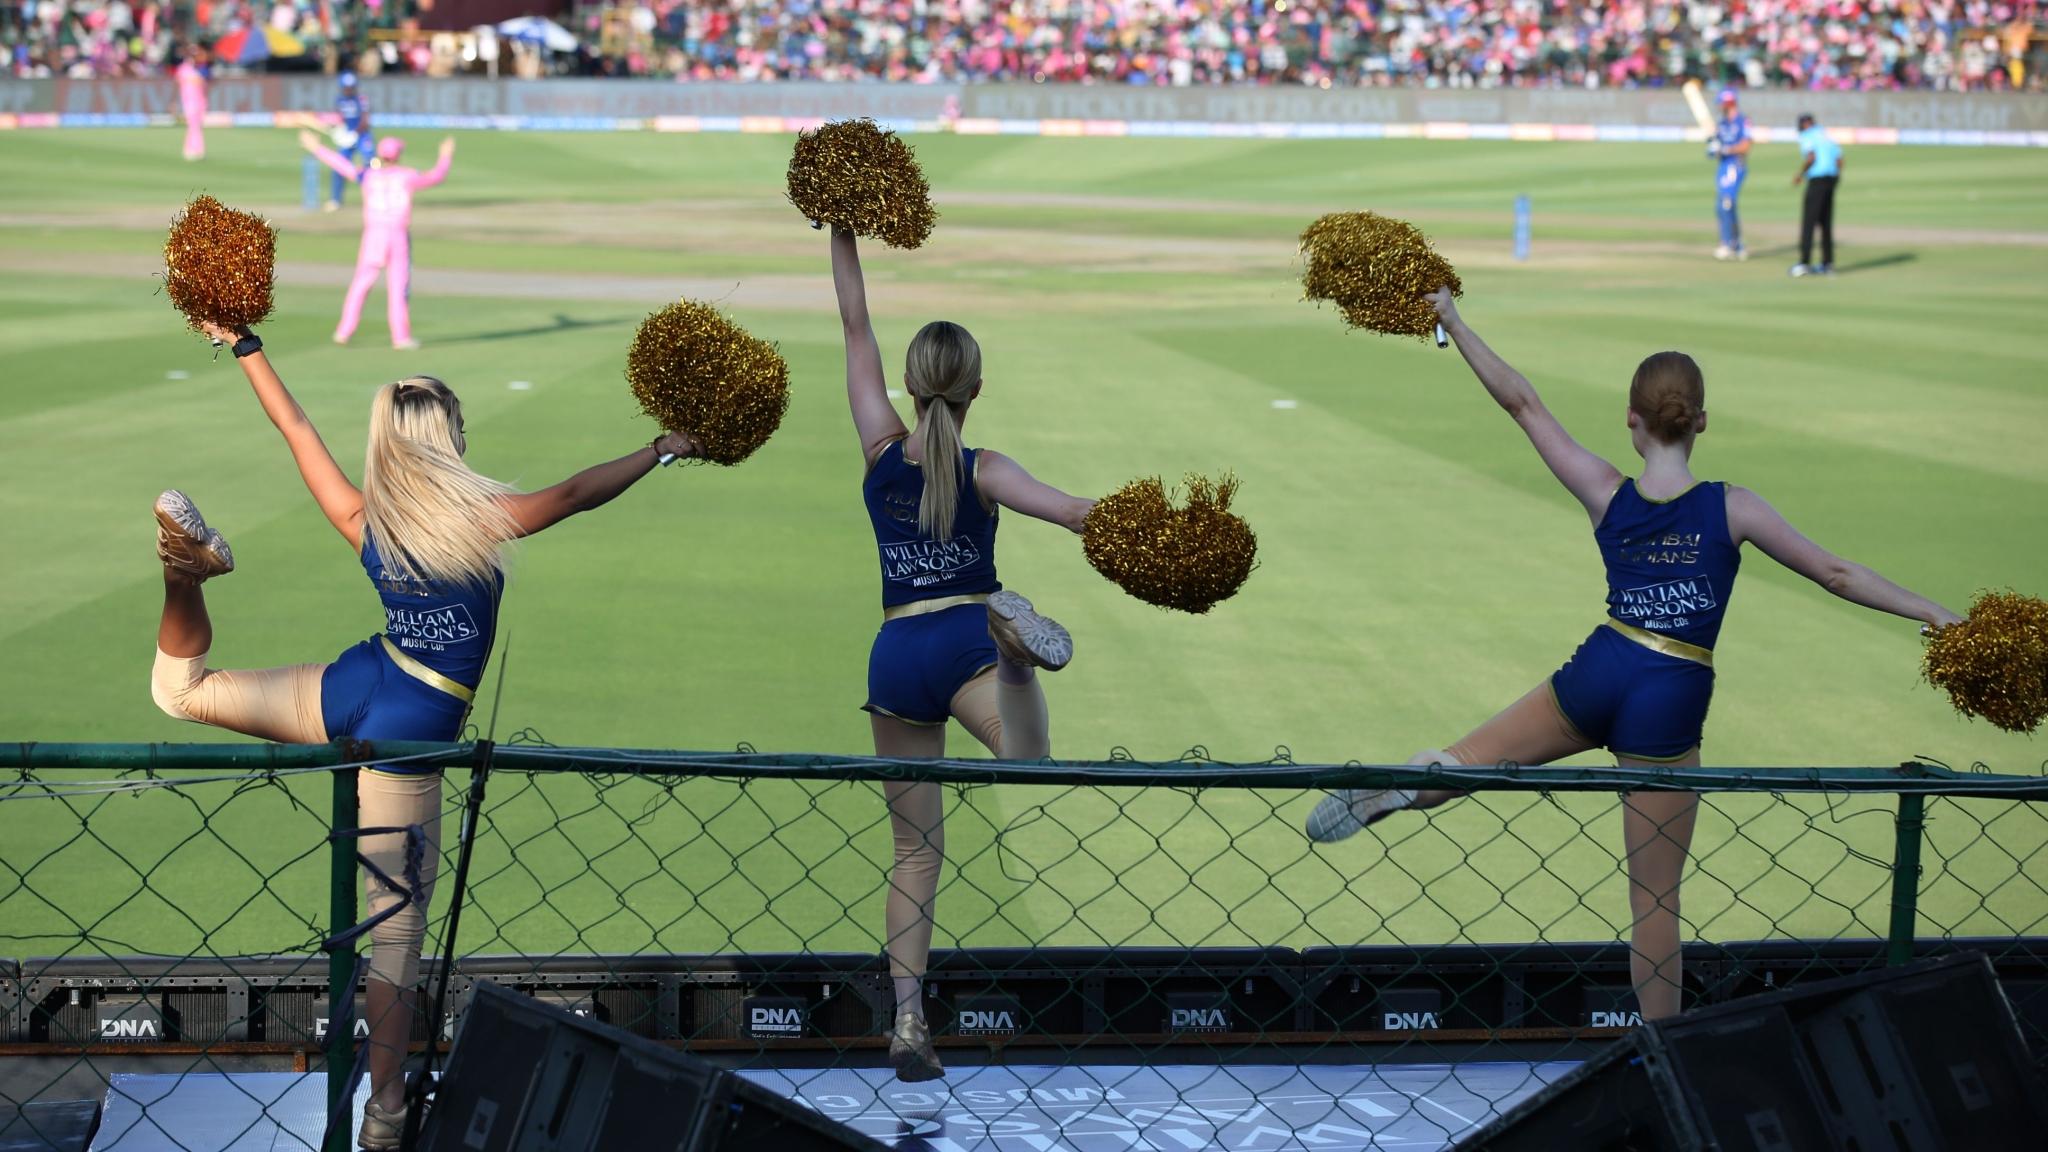 'Walking Porn', 'Pieces of Meat': Why Do We Need IPL Cheerleaders?